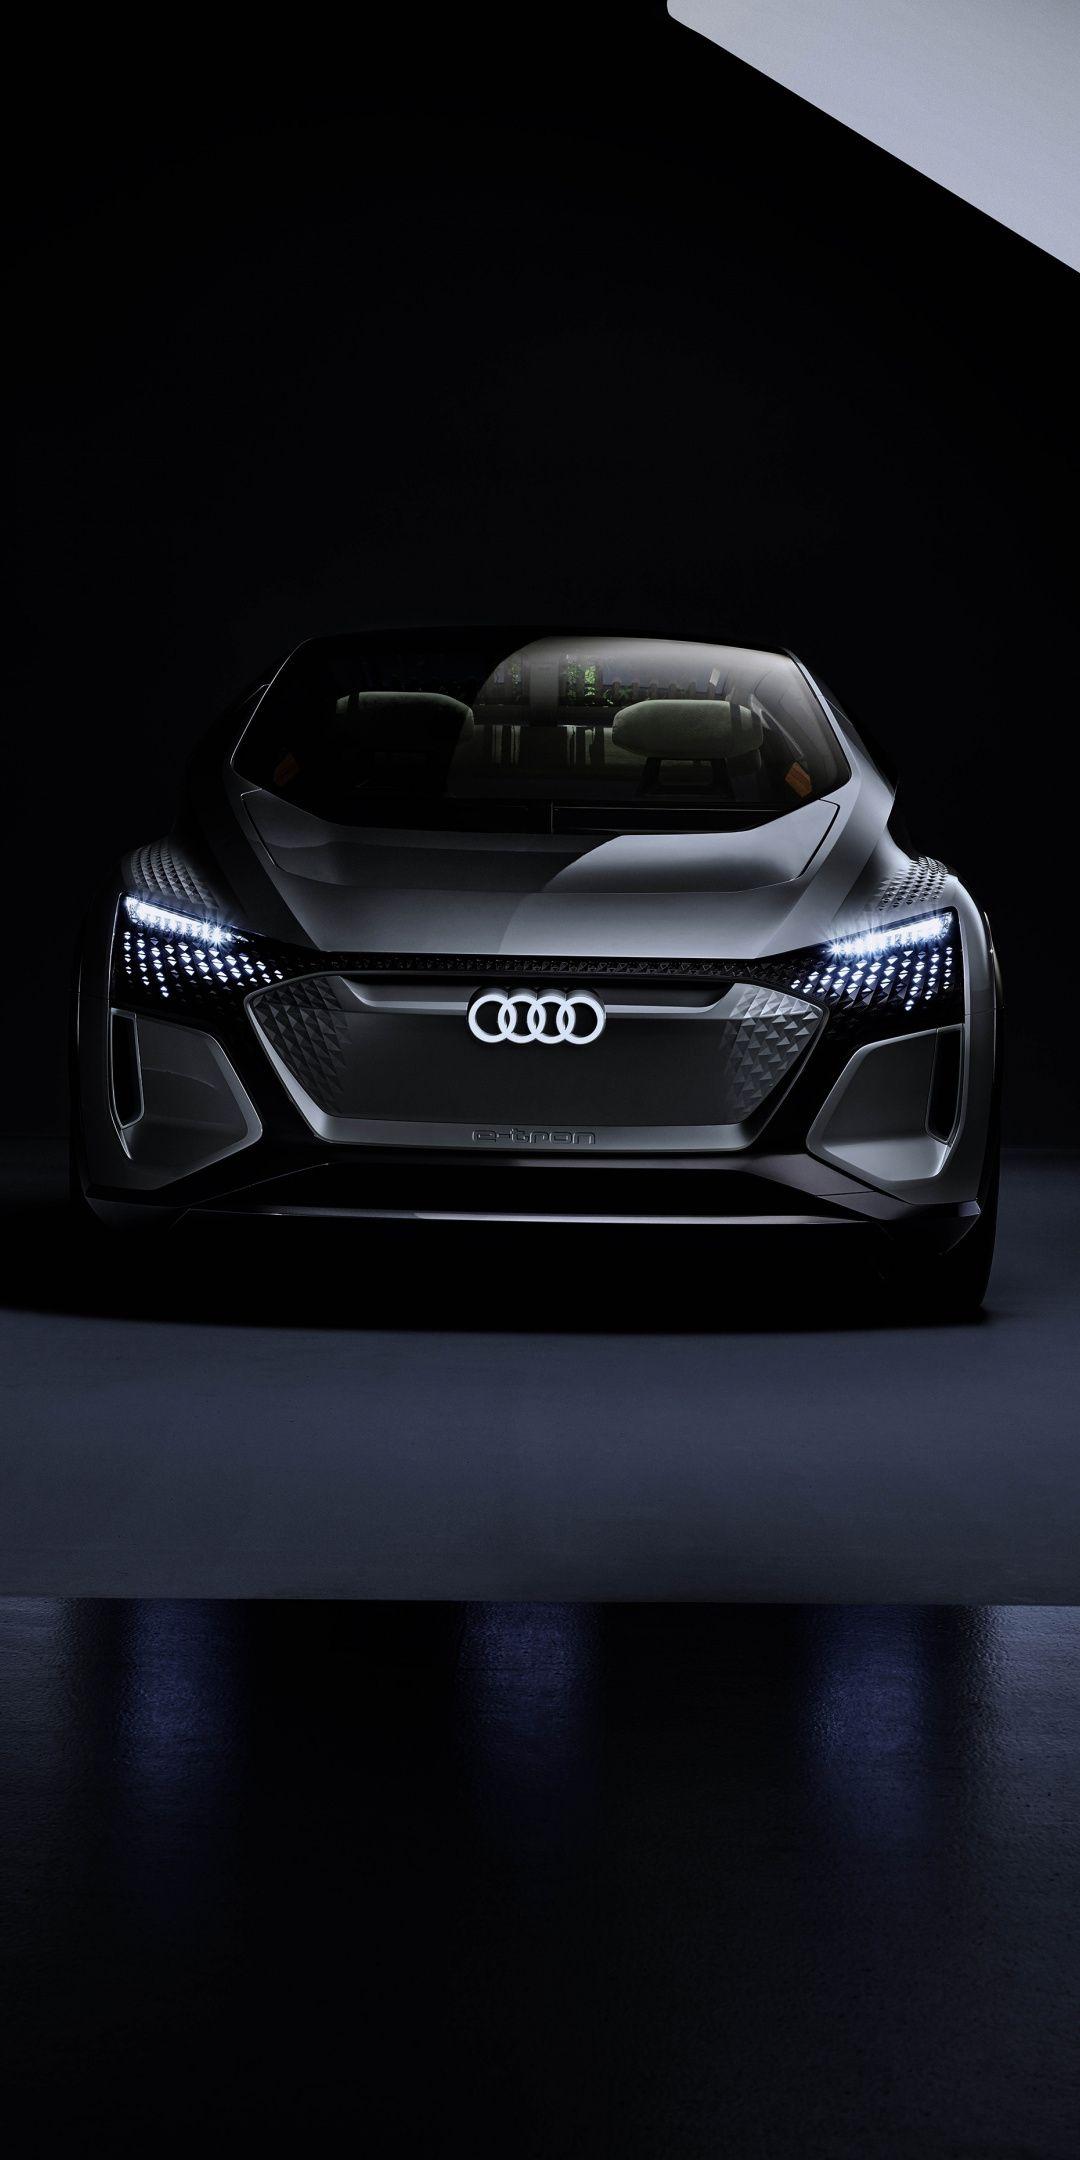 Audi Ai Me Concept Car Black 2019 Wallpaper Concept Cars Car Accessories For Guys Car Wallpapers